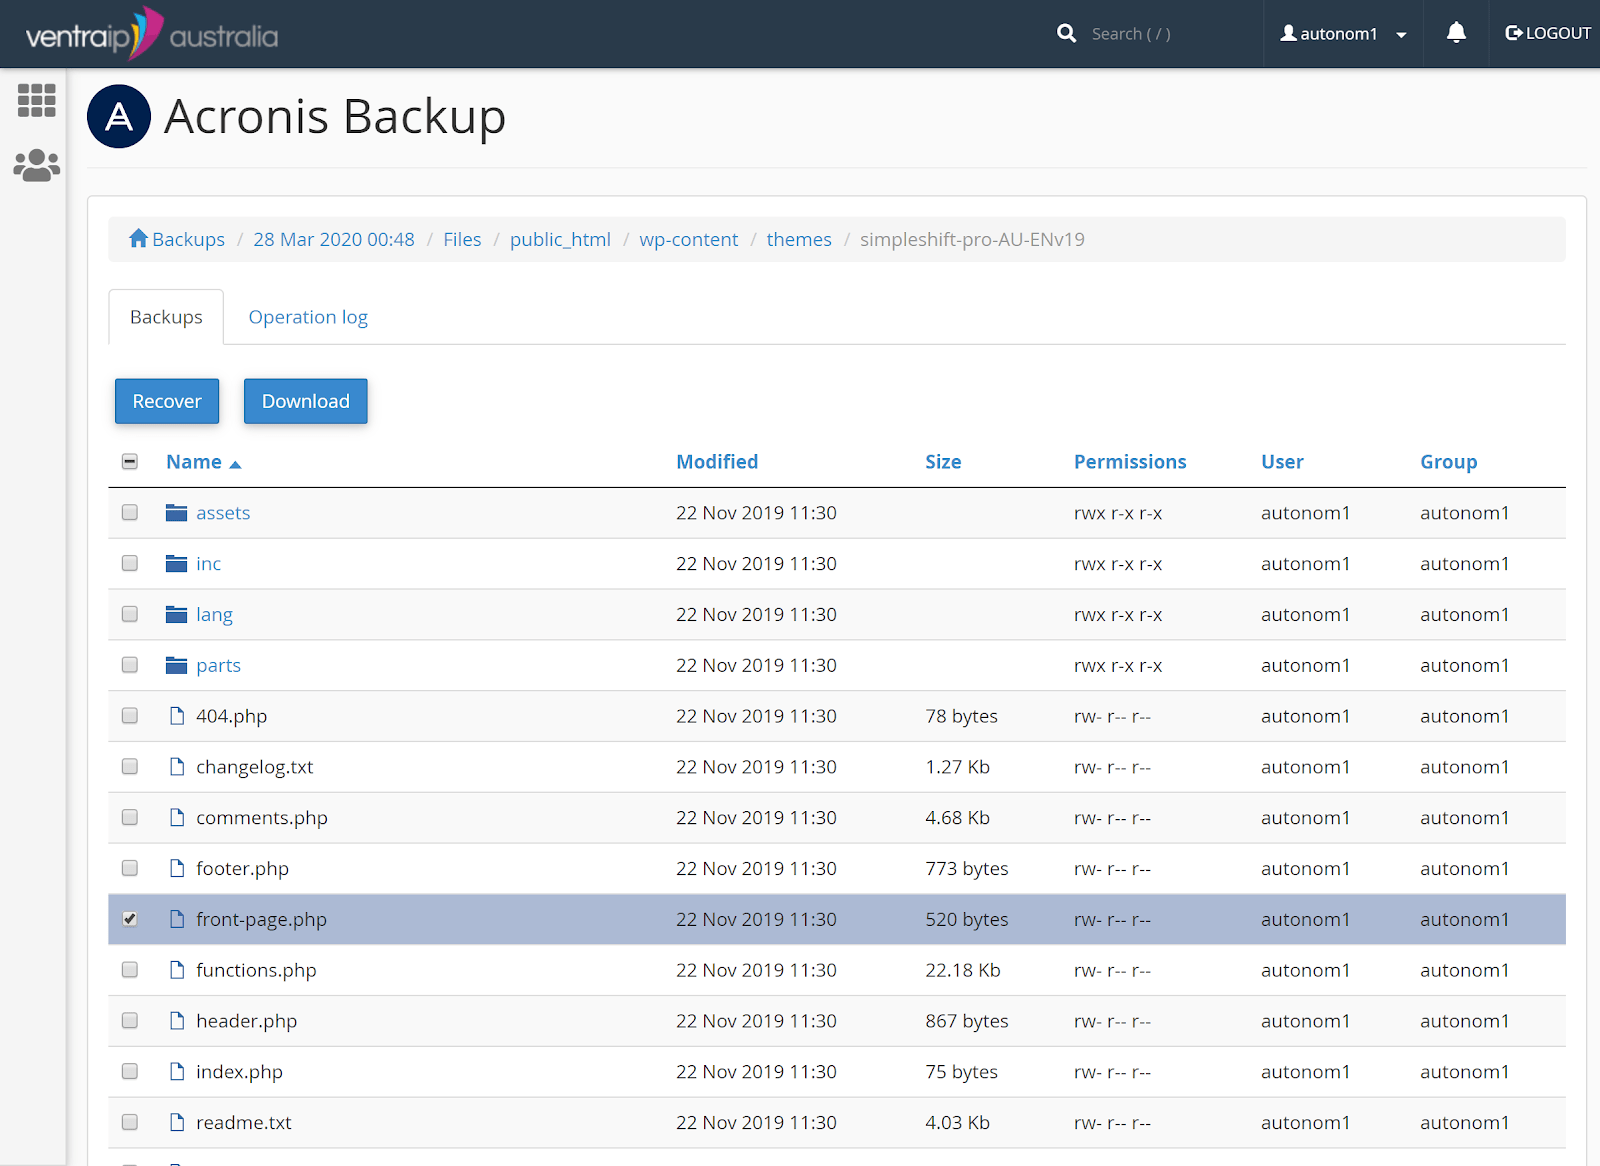 The Acronis backup tool